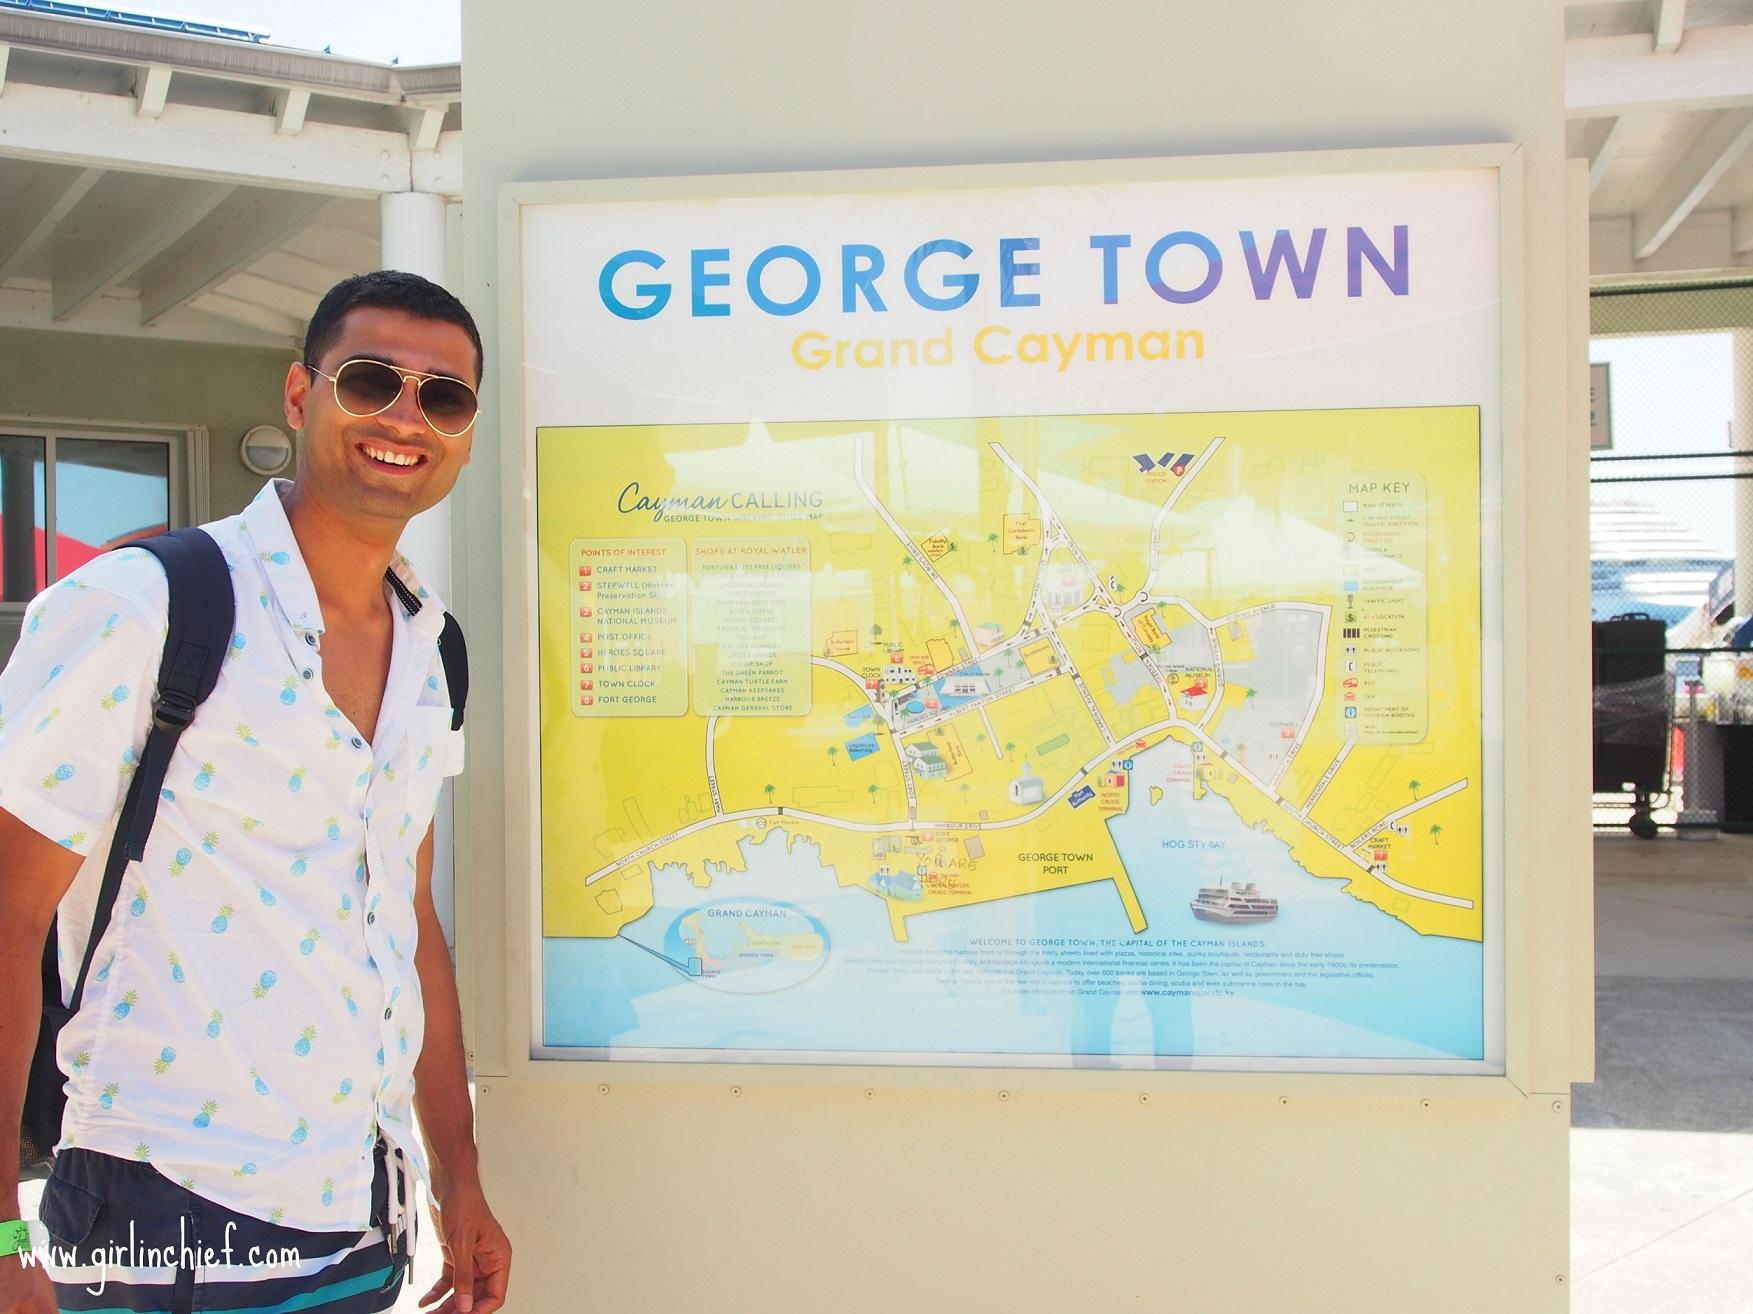 georgetown-grand-cayman-island-carnival-caribbean-cruise